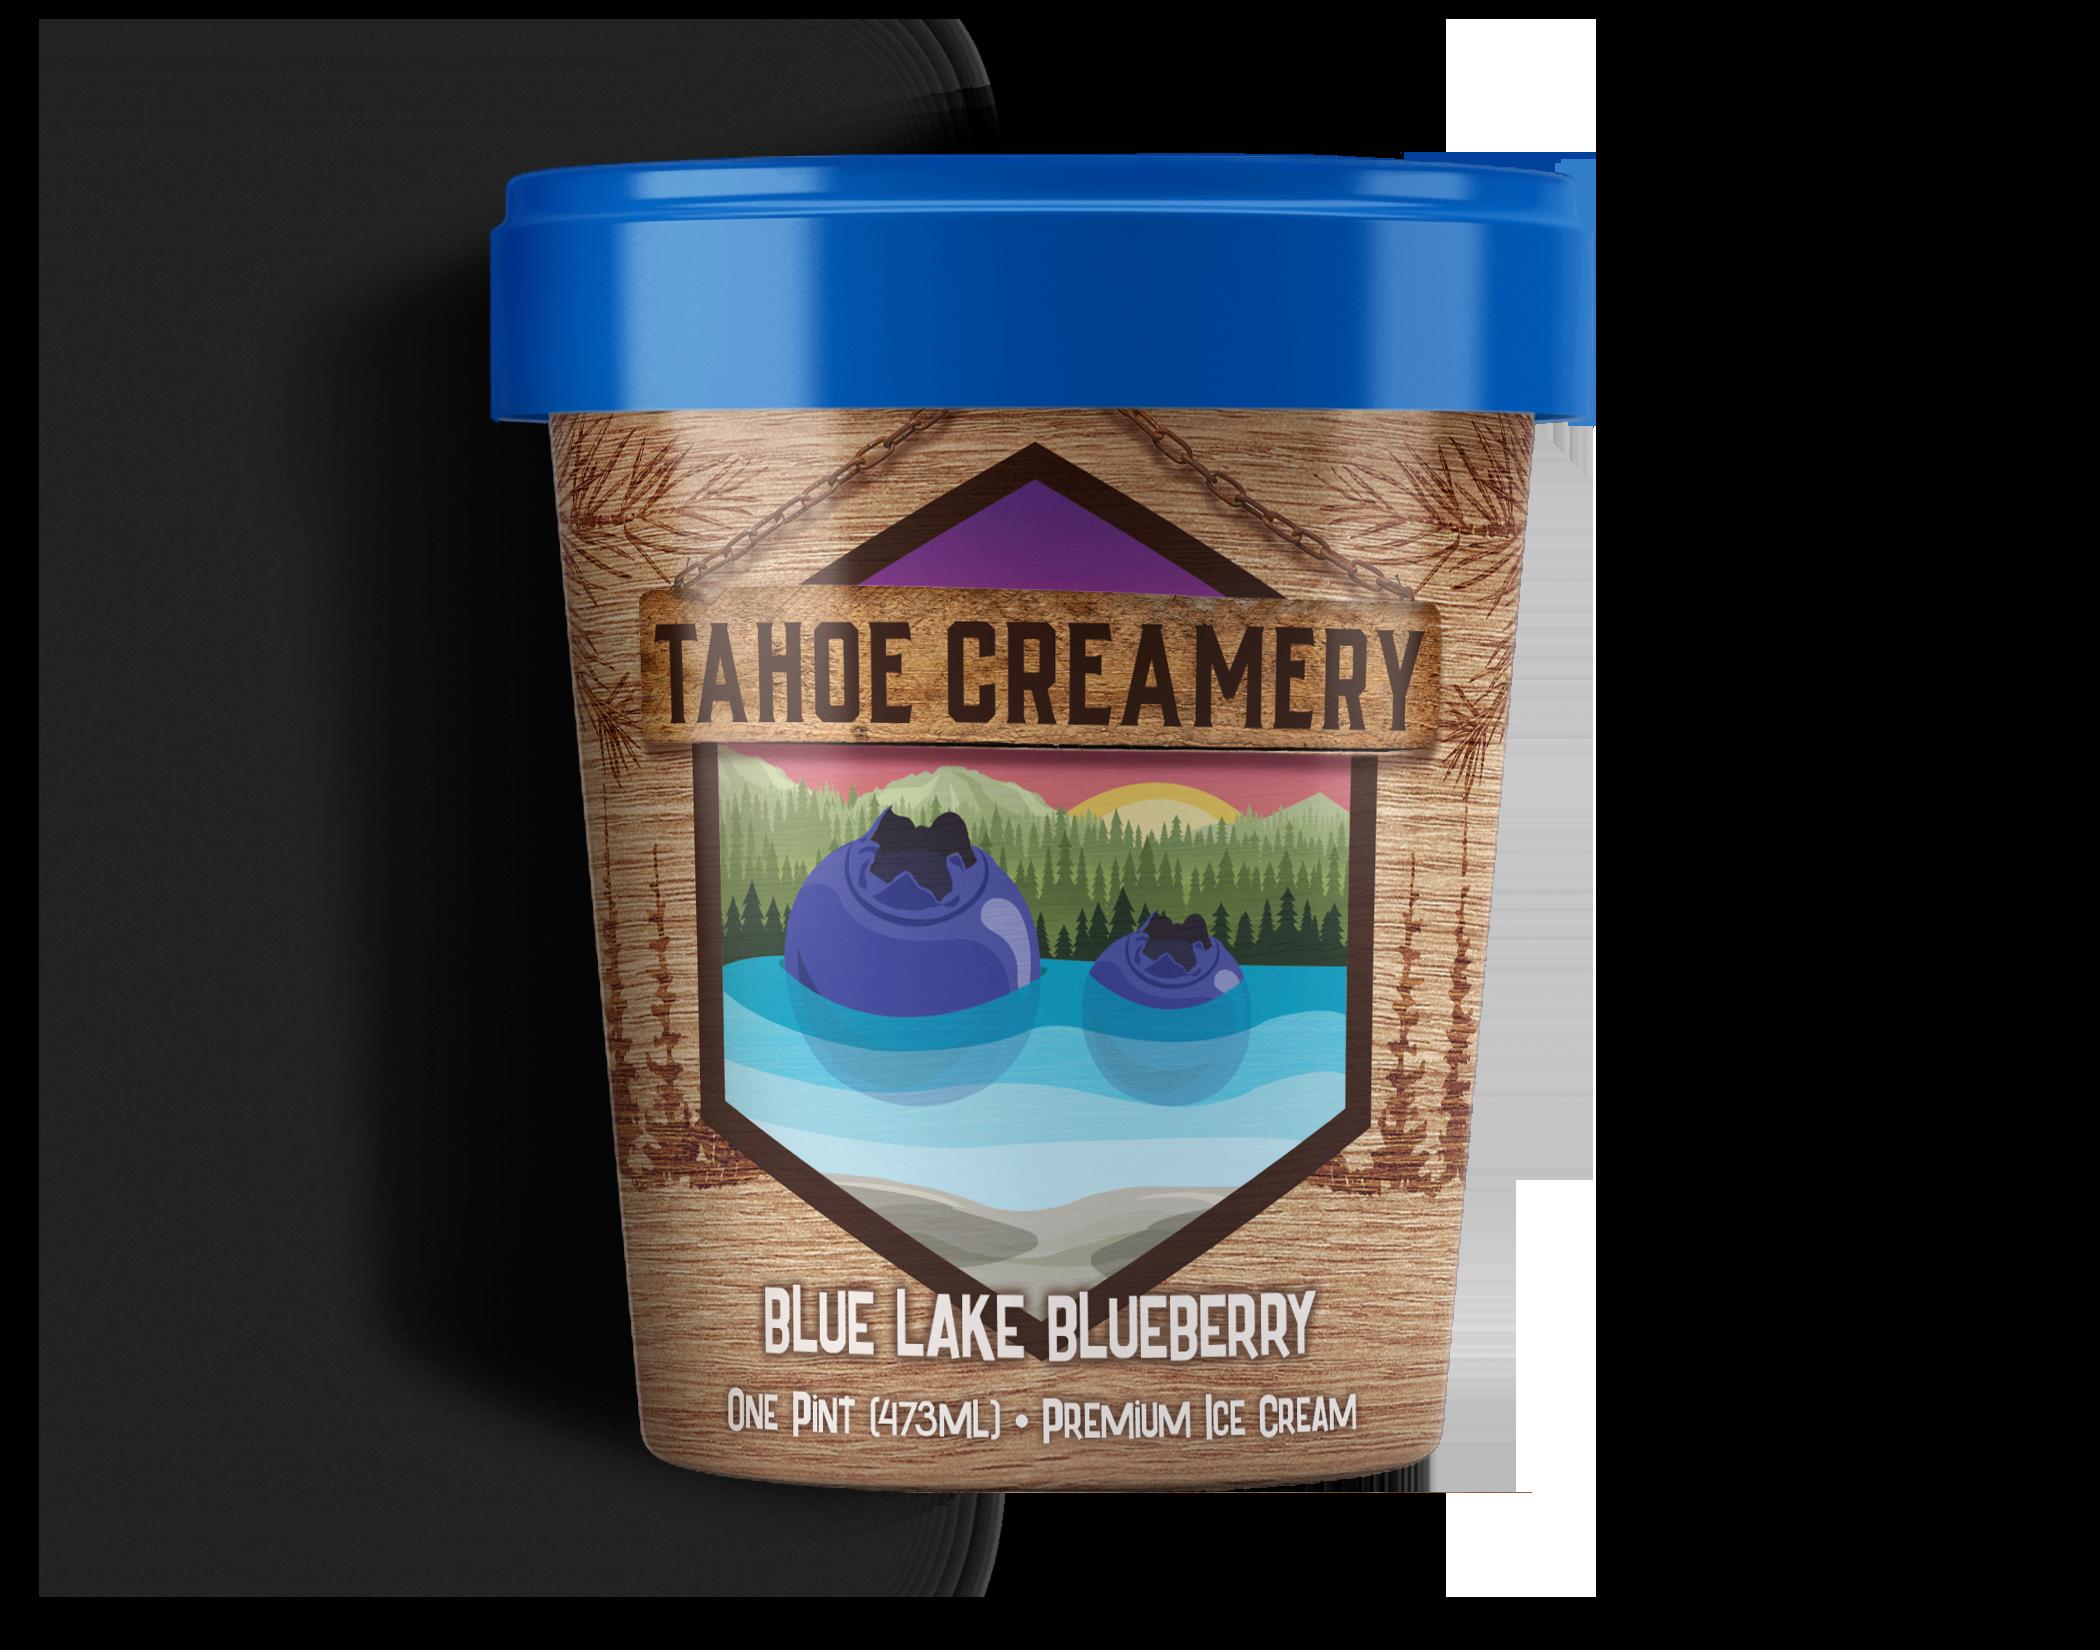 Blue Lake Blueberry